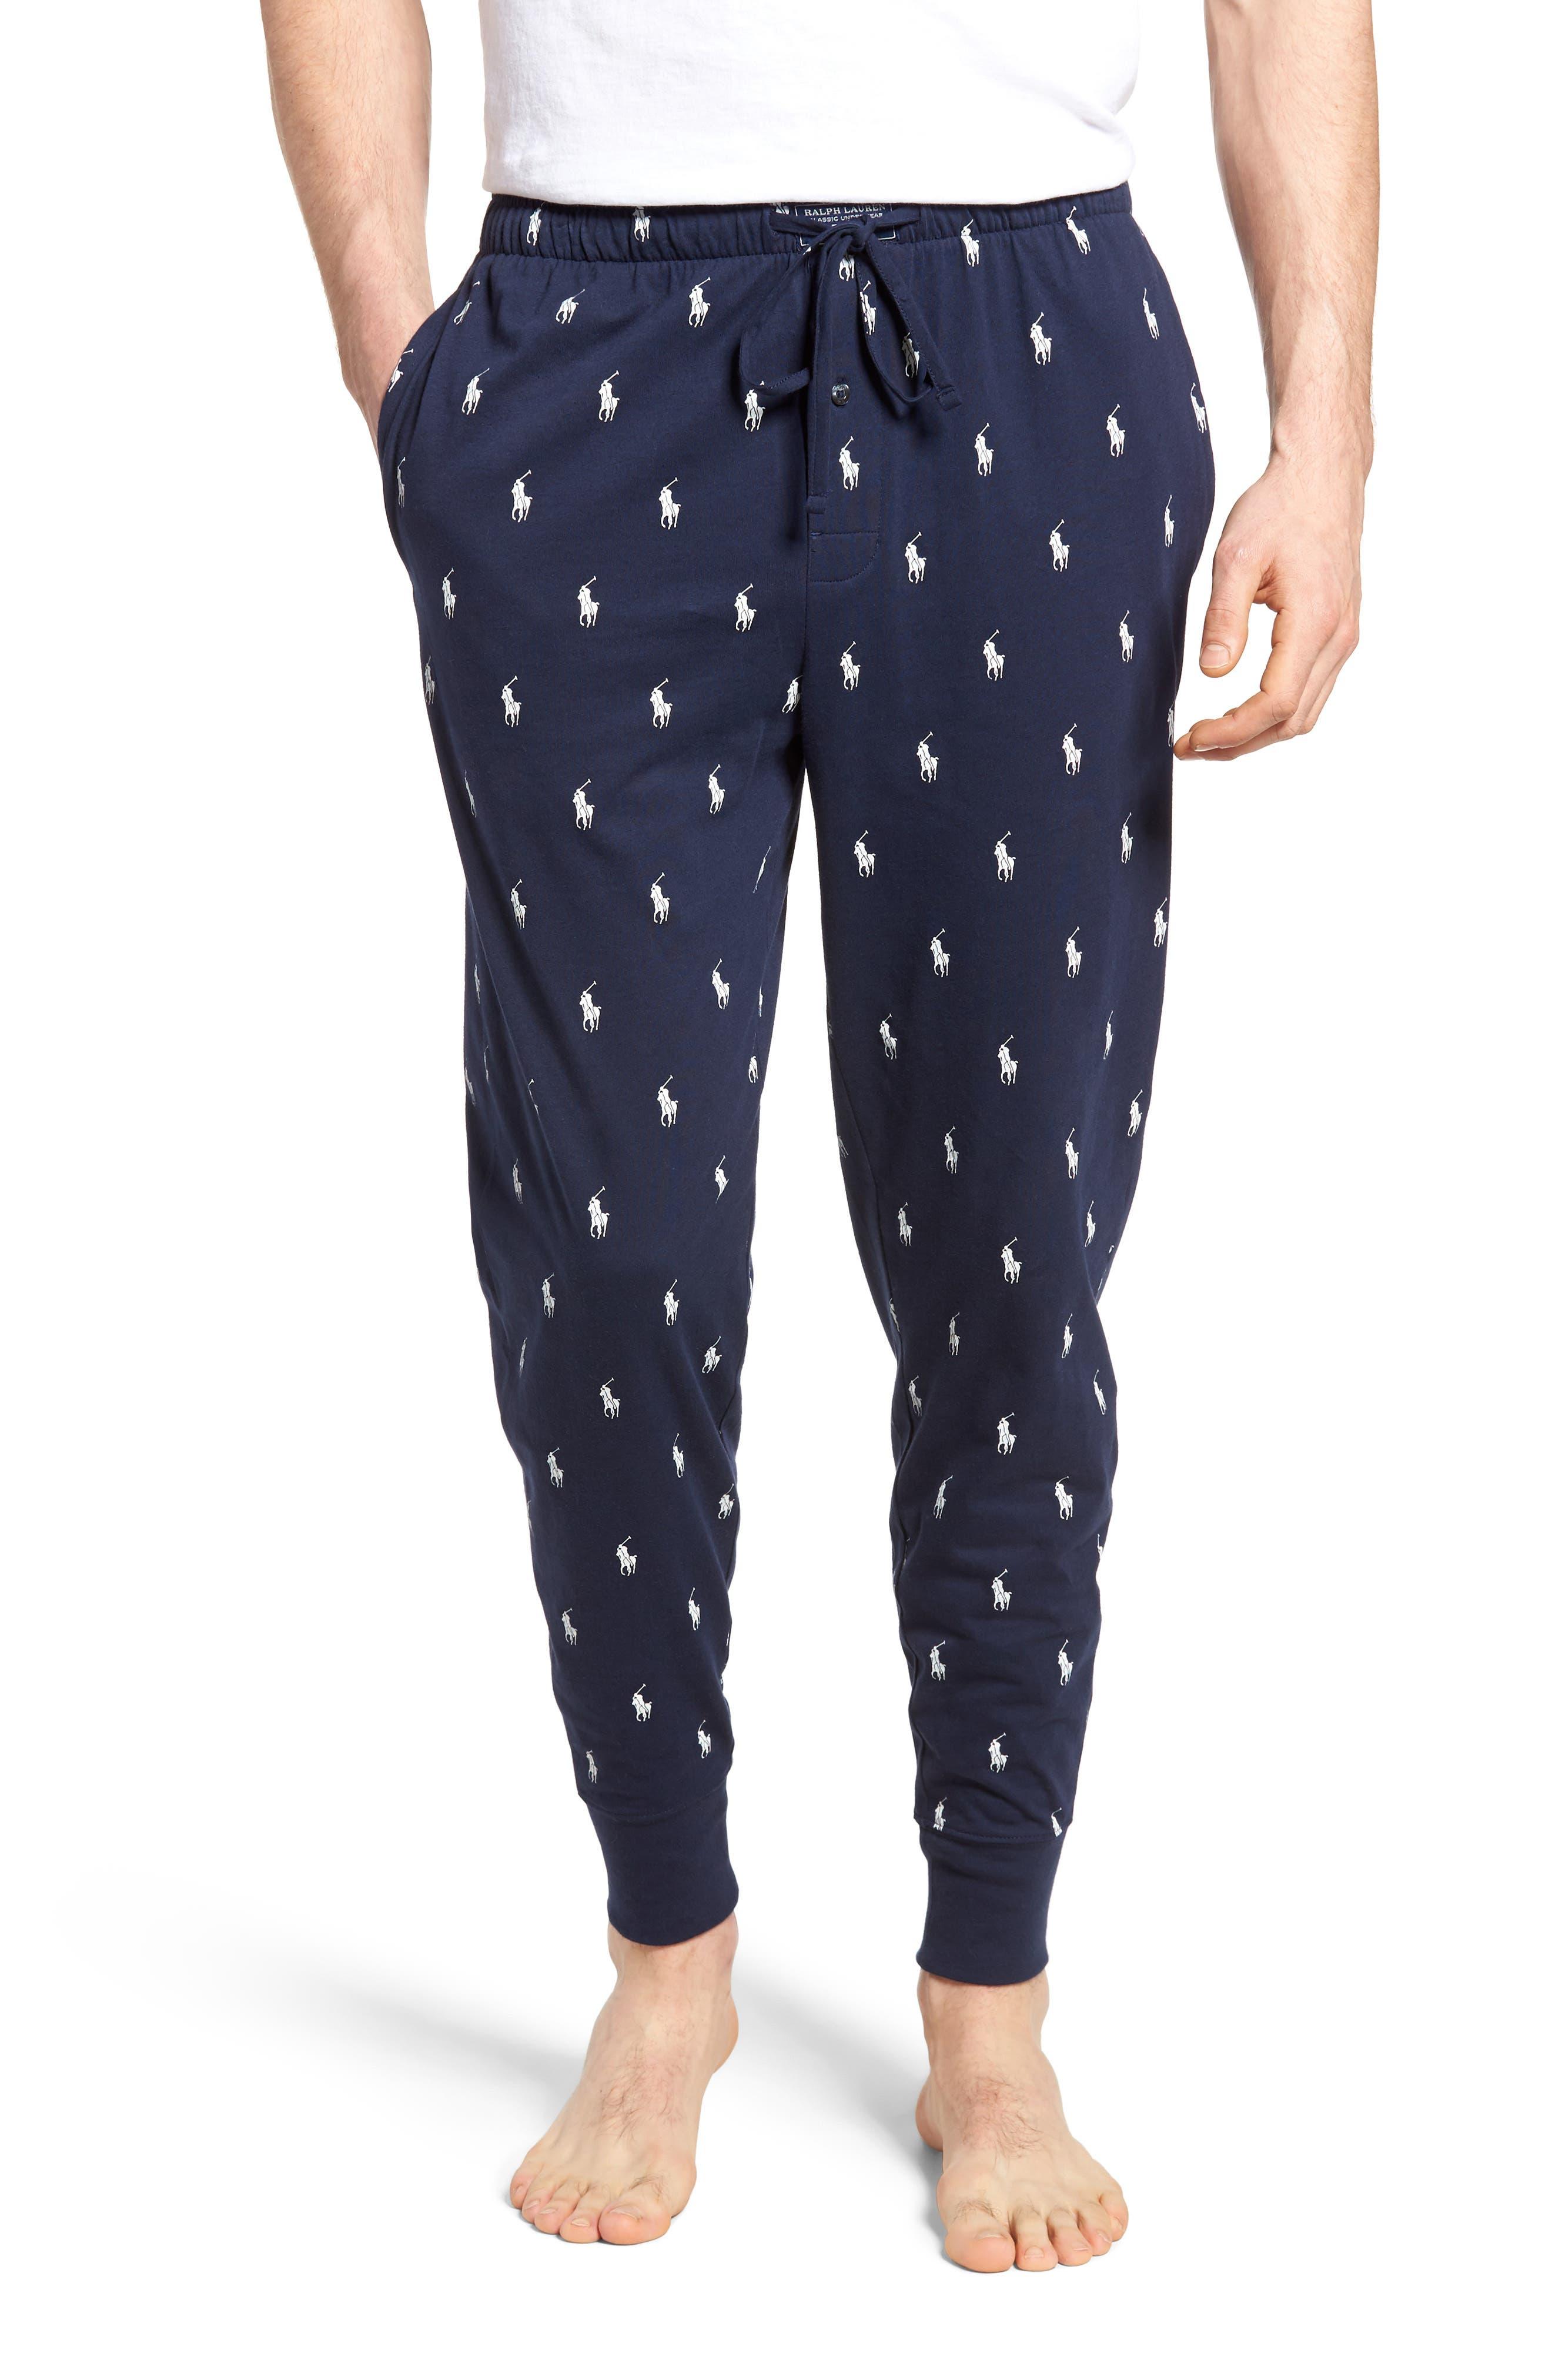 Main Image - Polo Ralph Lauren Knit Pony Lounge Pants